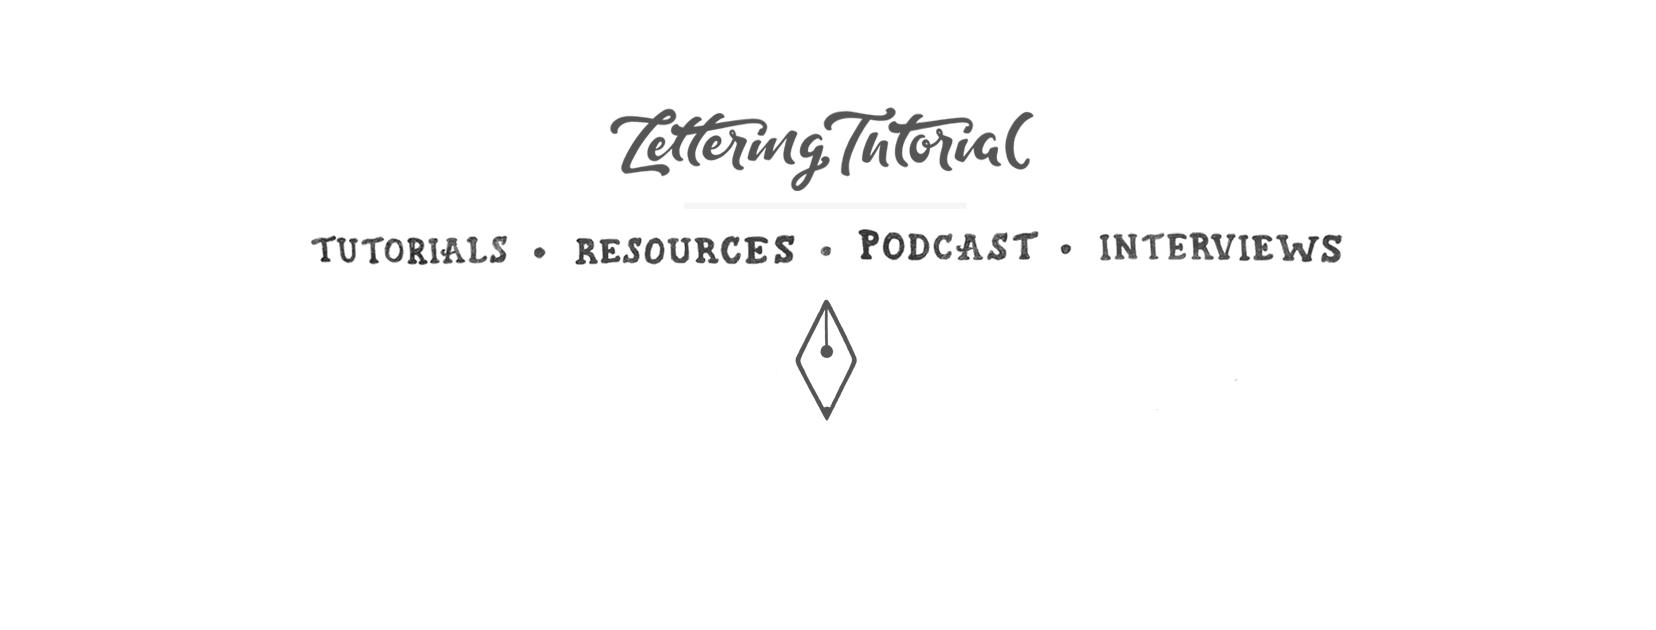 Hand Lettering Tutorial - Learn Lettering